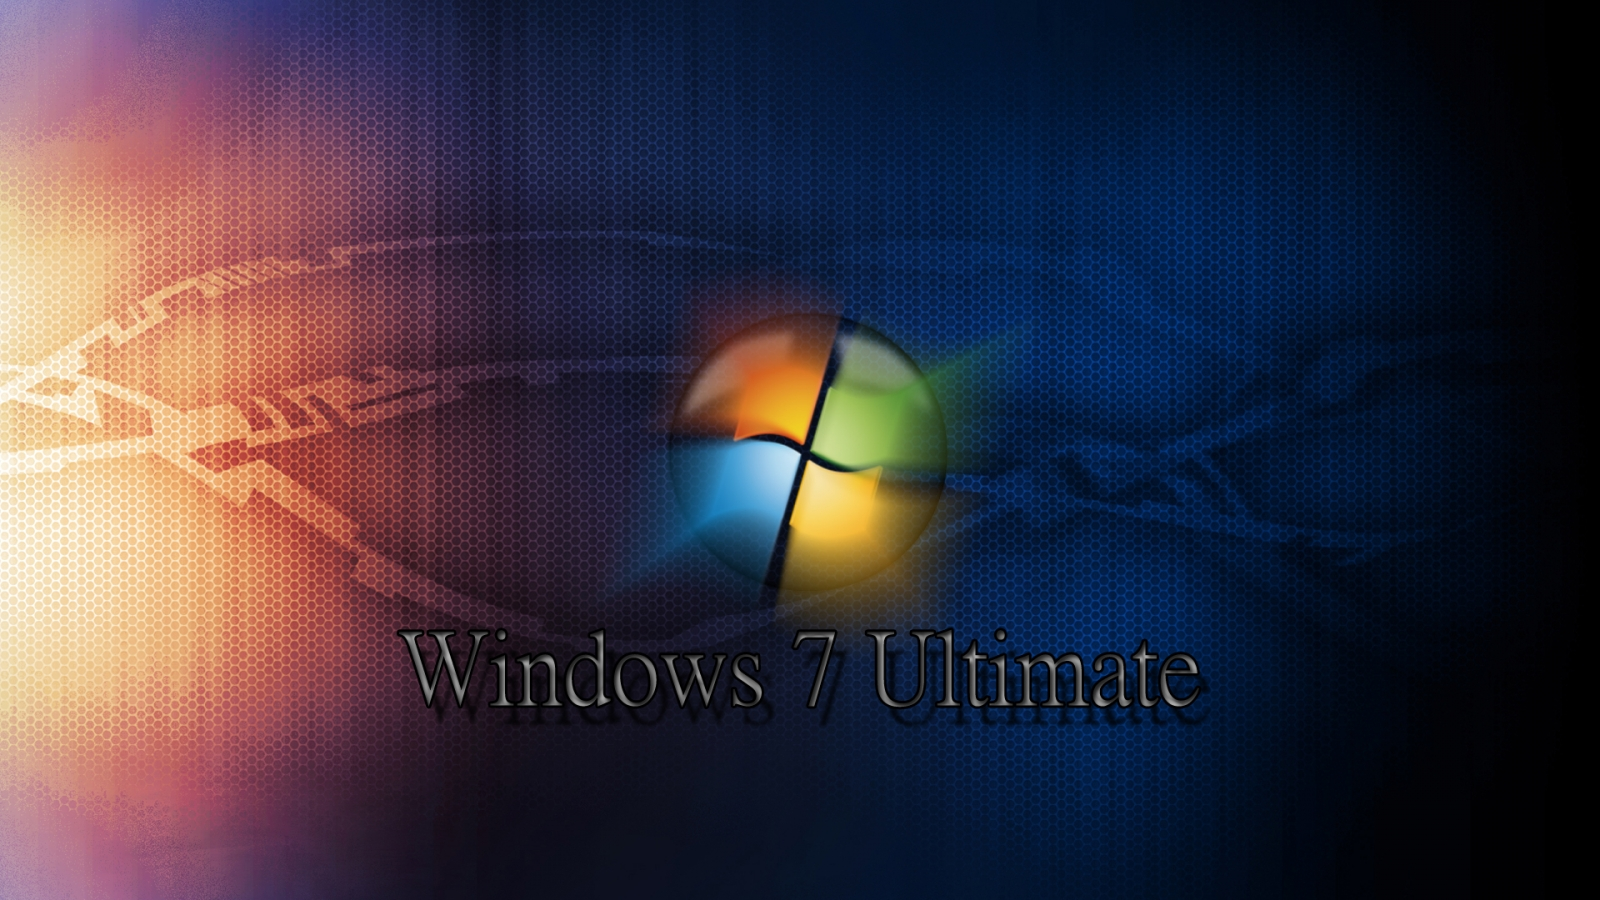 download Technet Microsoft wallpaper 138545 [1920x1200] for 1600x900